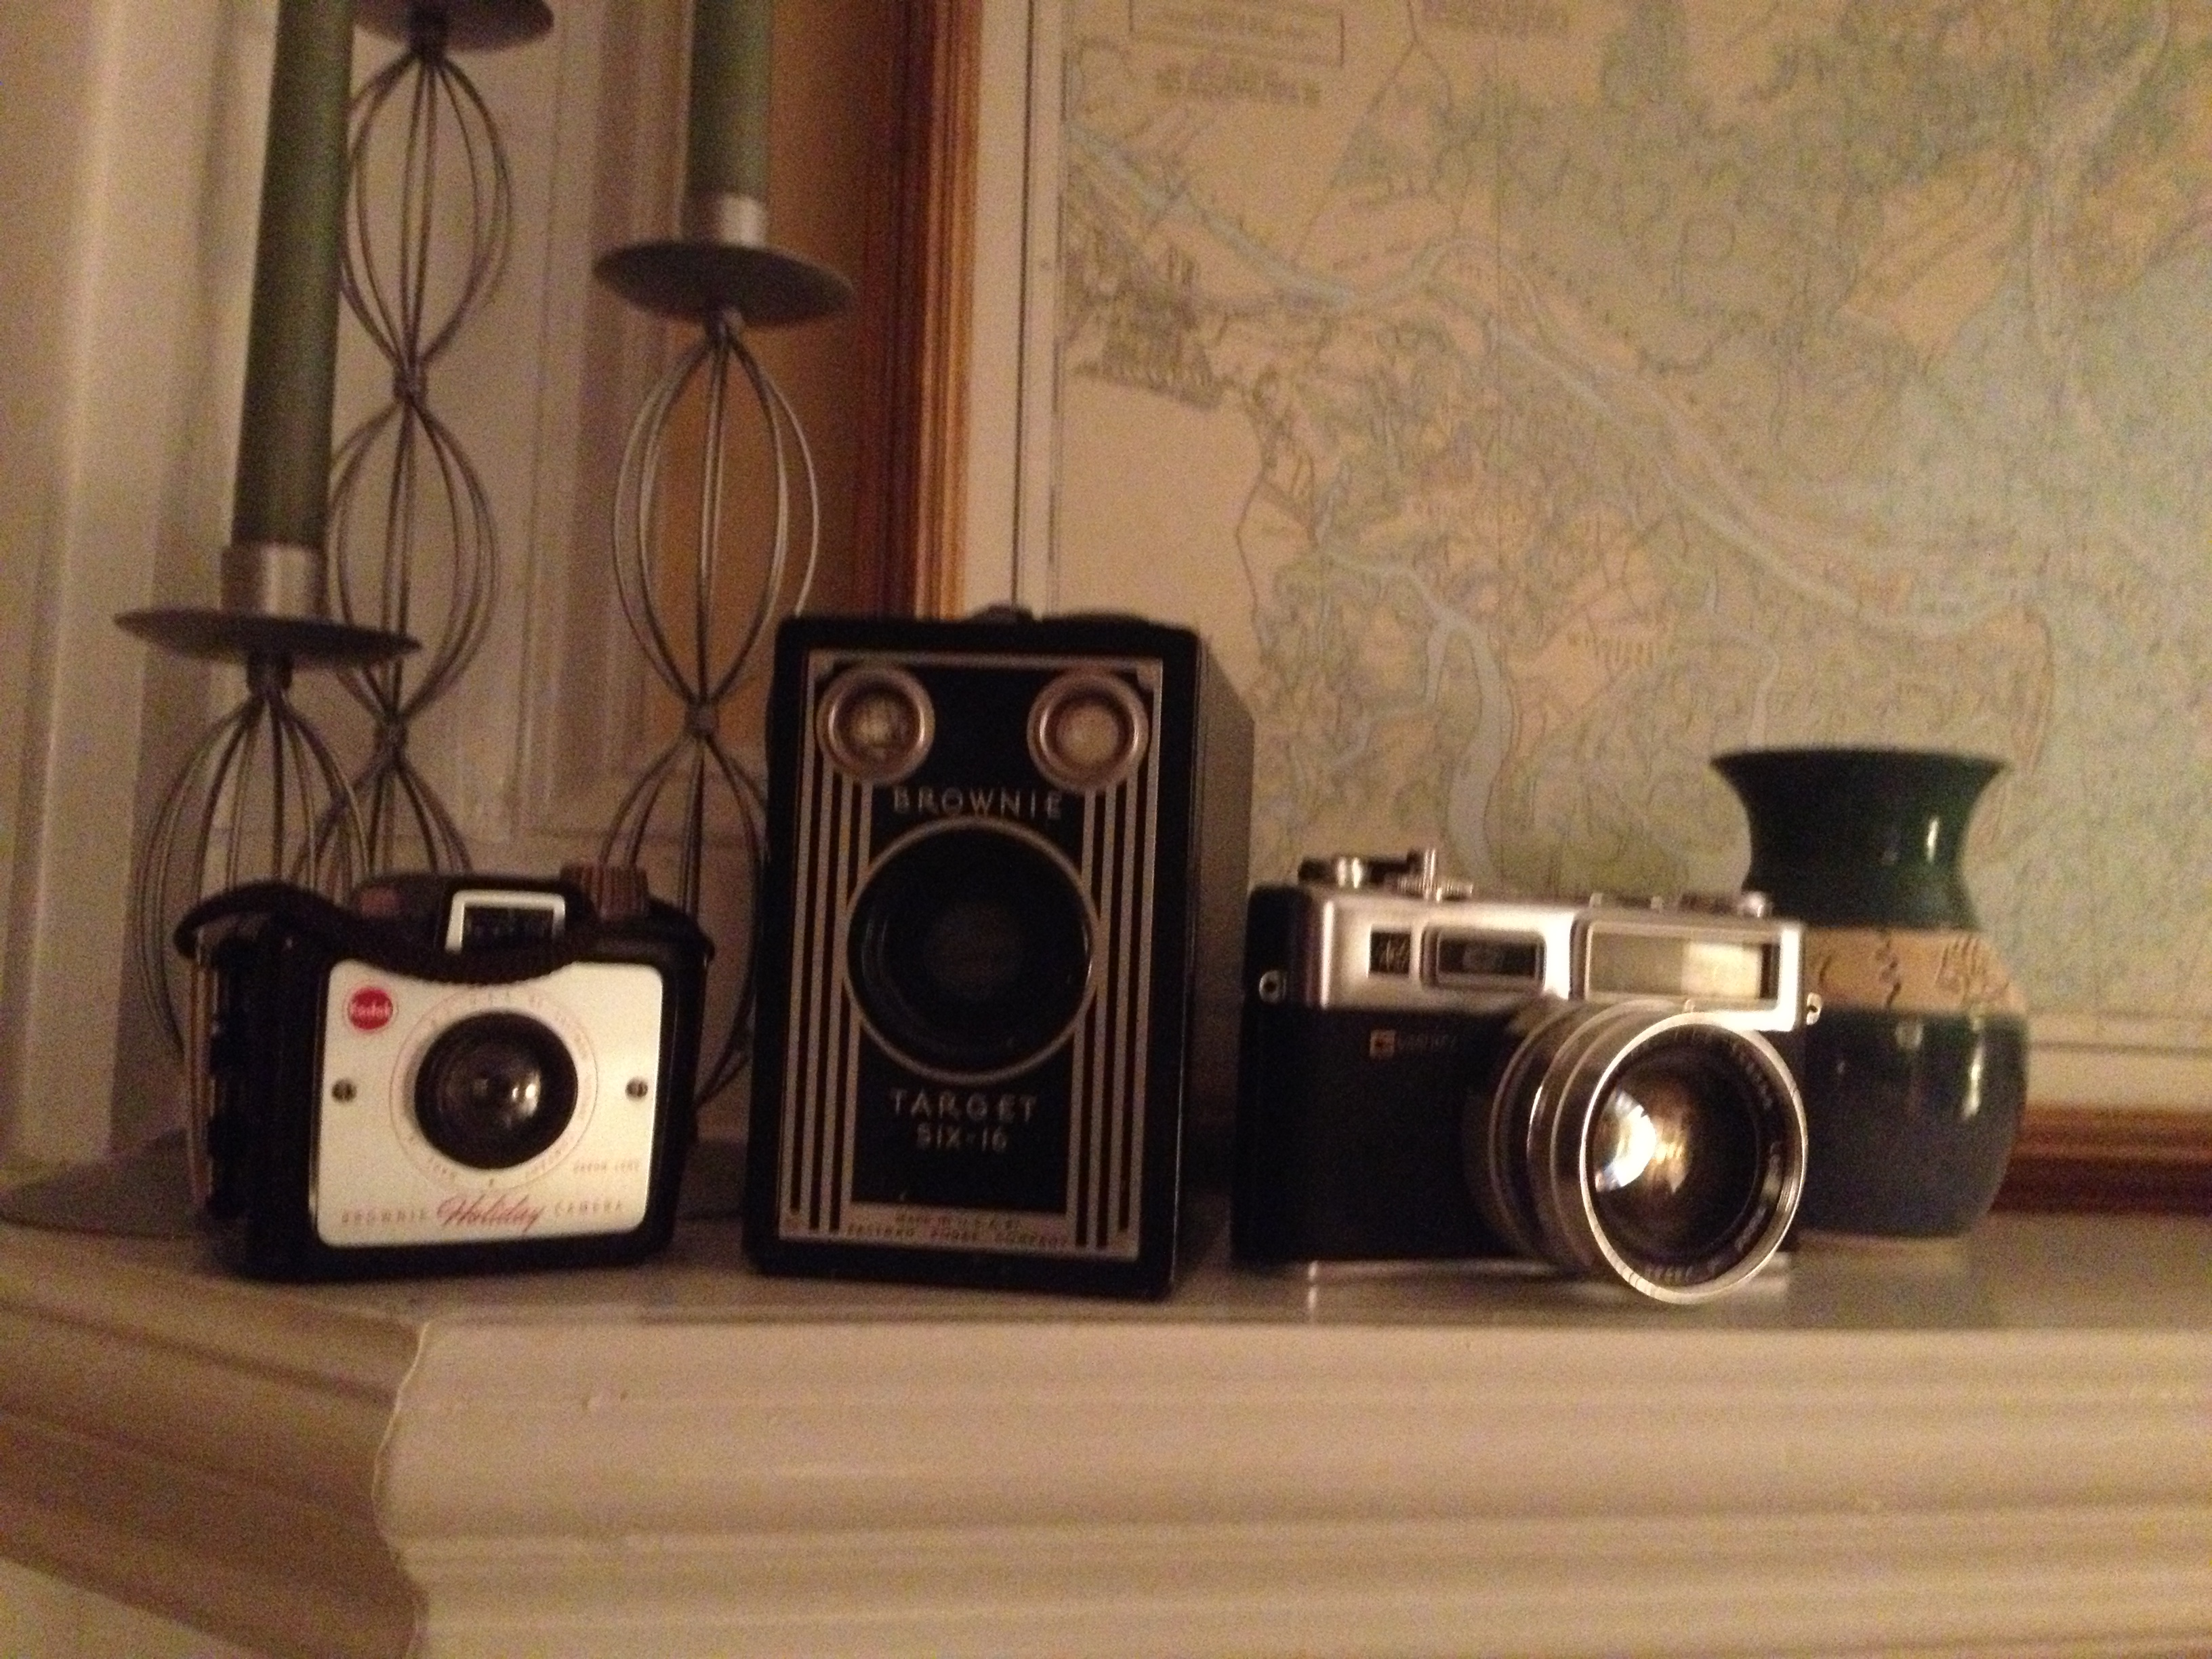 Three cameras